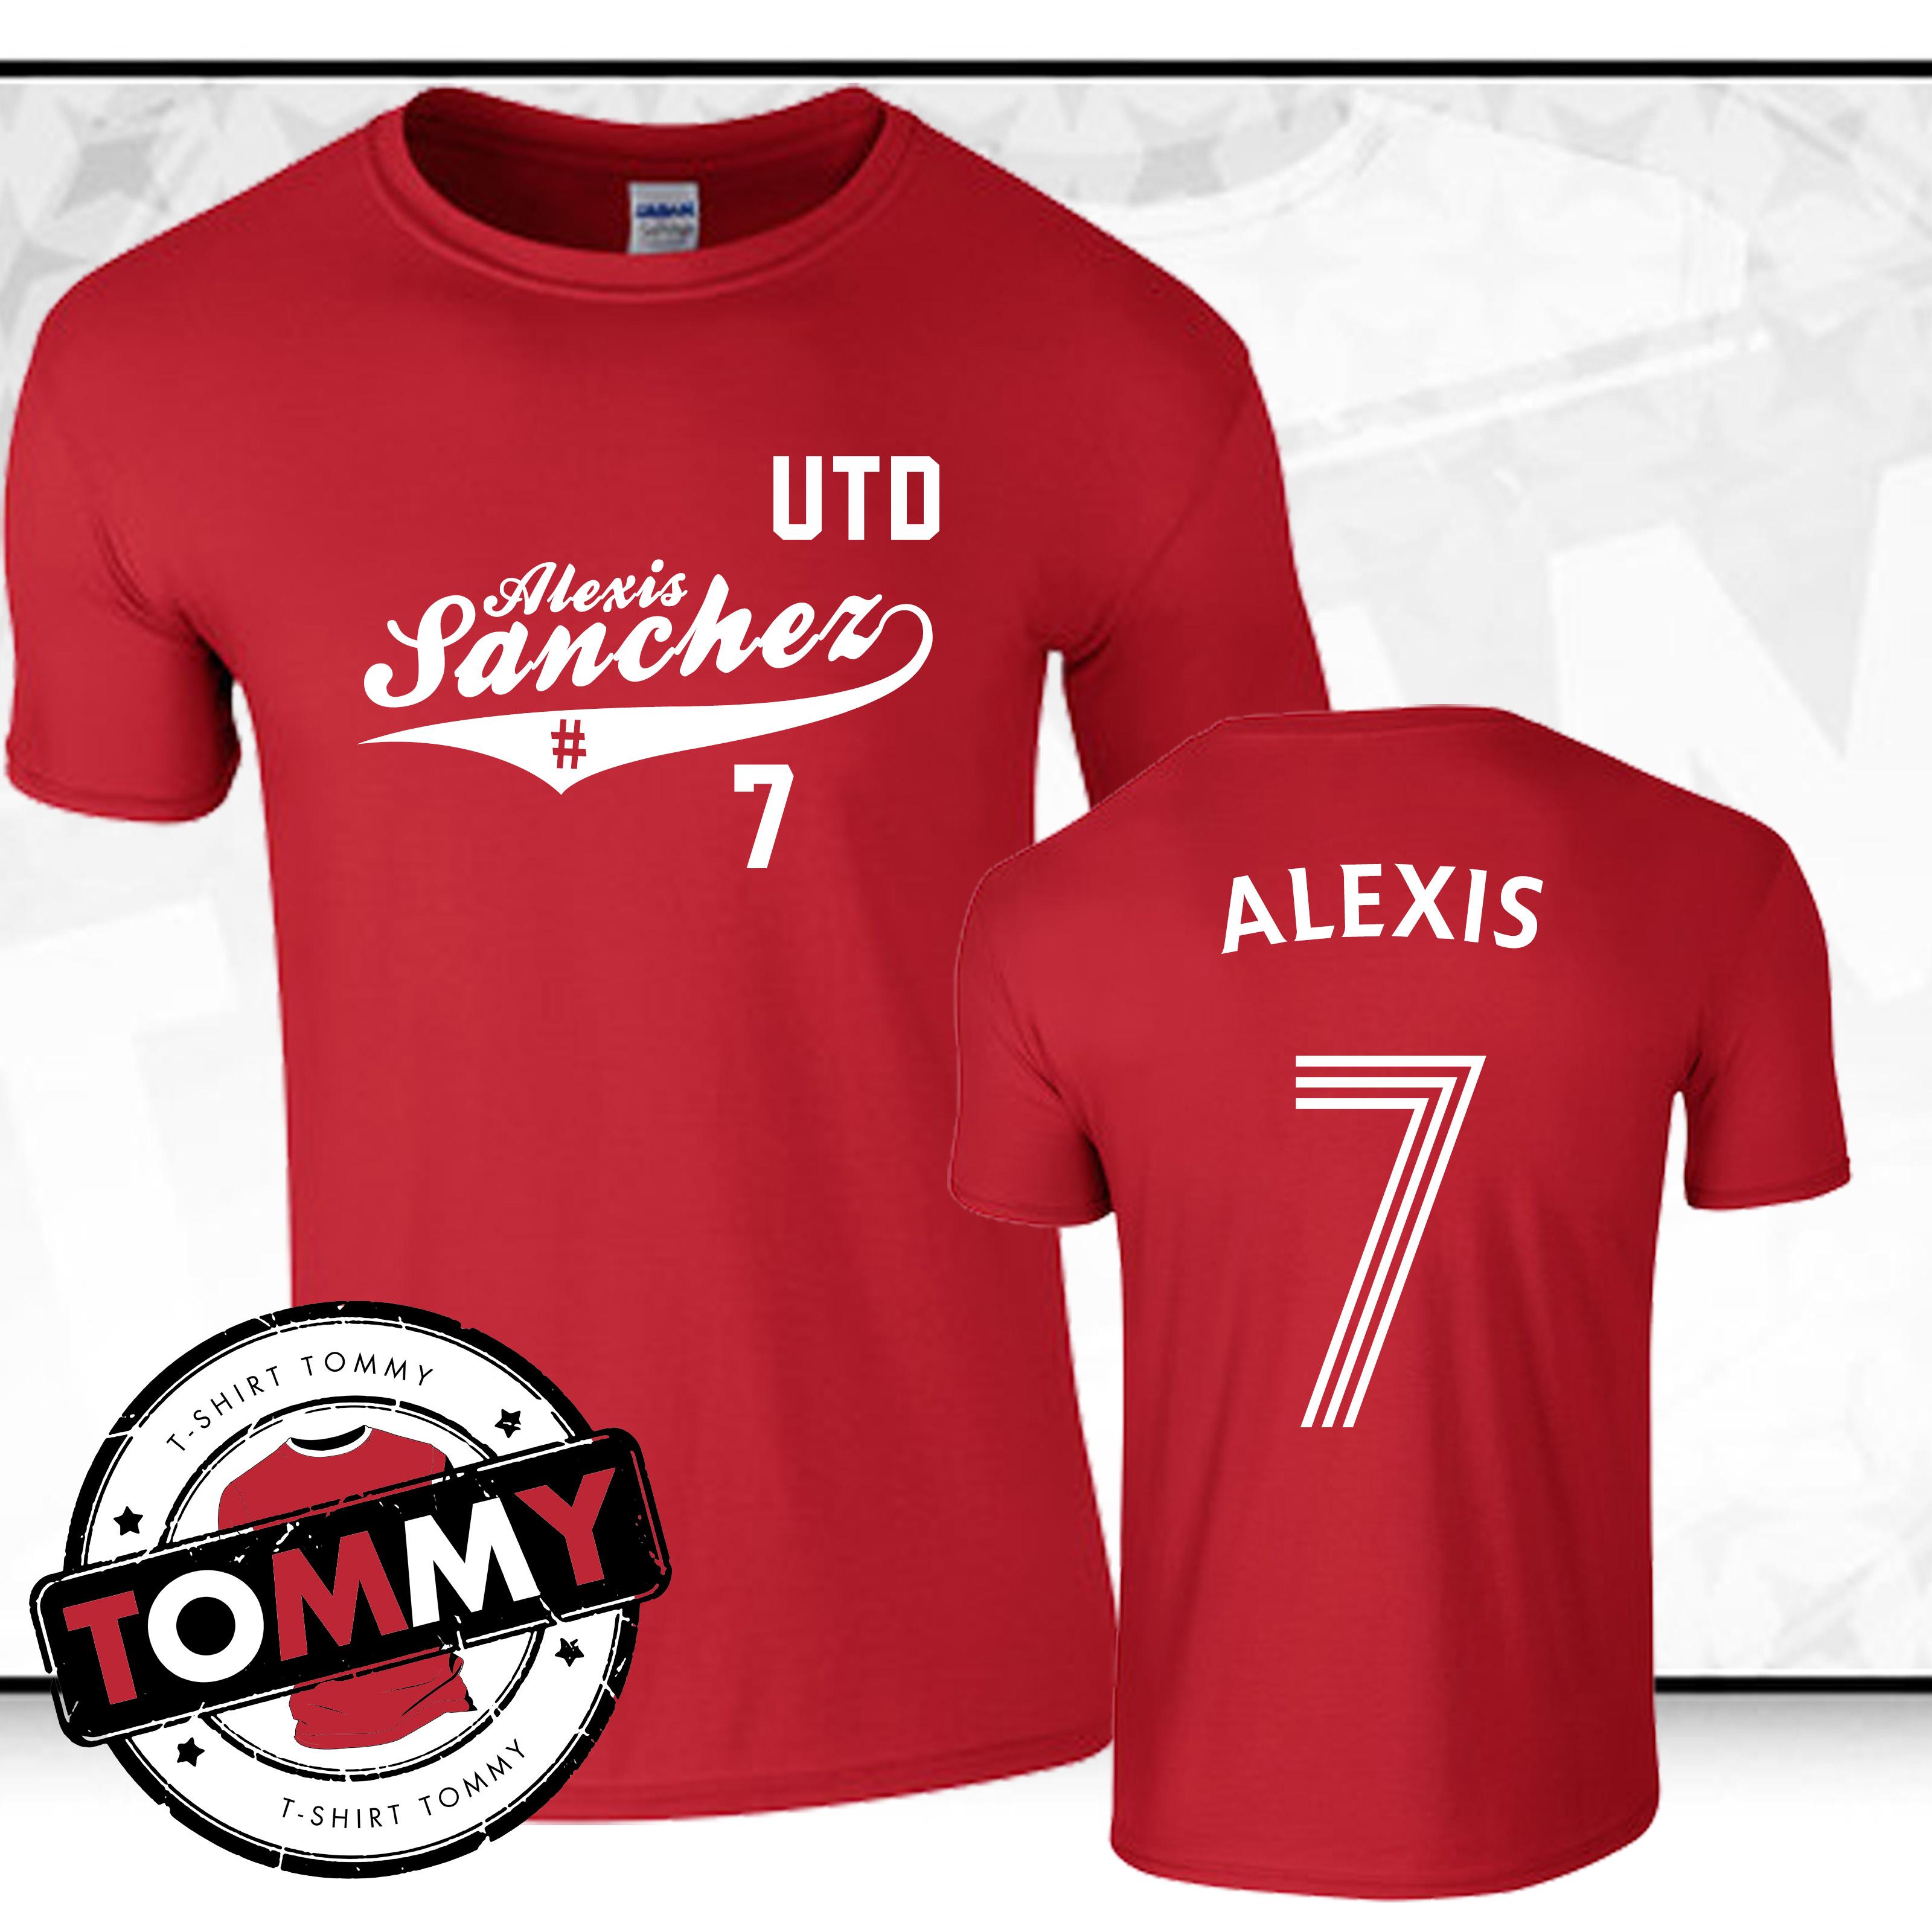 088ba4faf6d Alexis Sanchez United T-Shirt